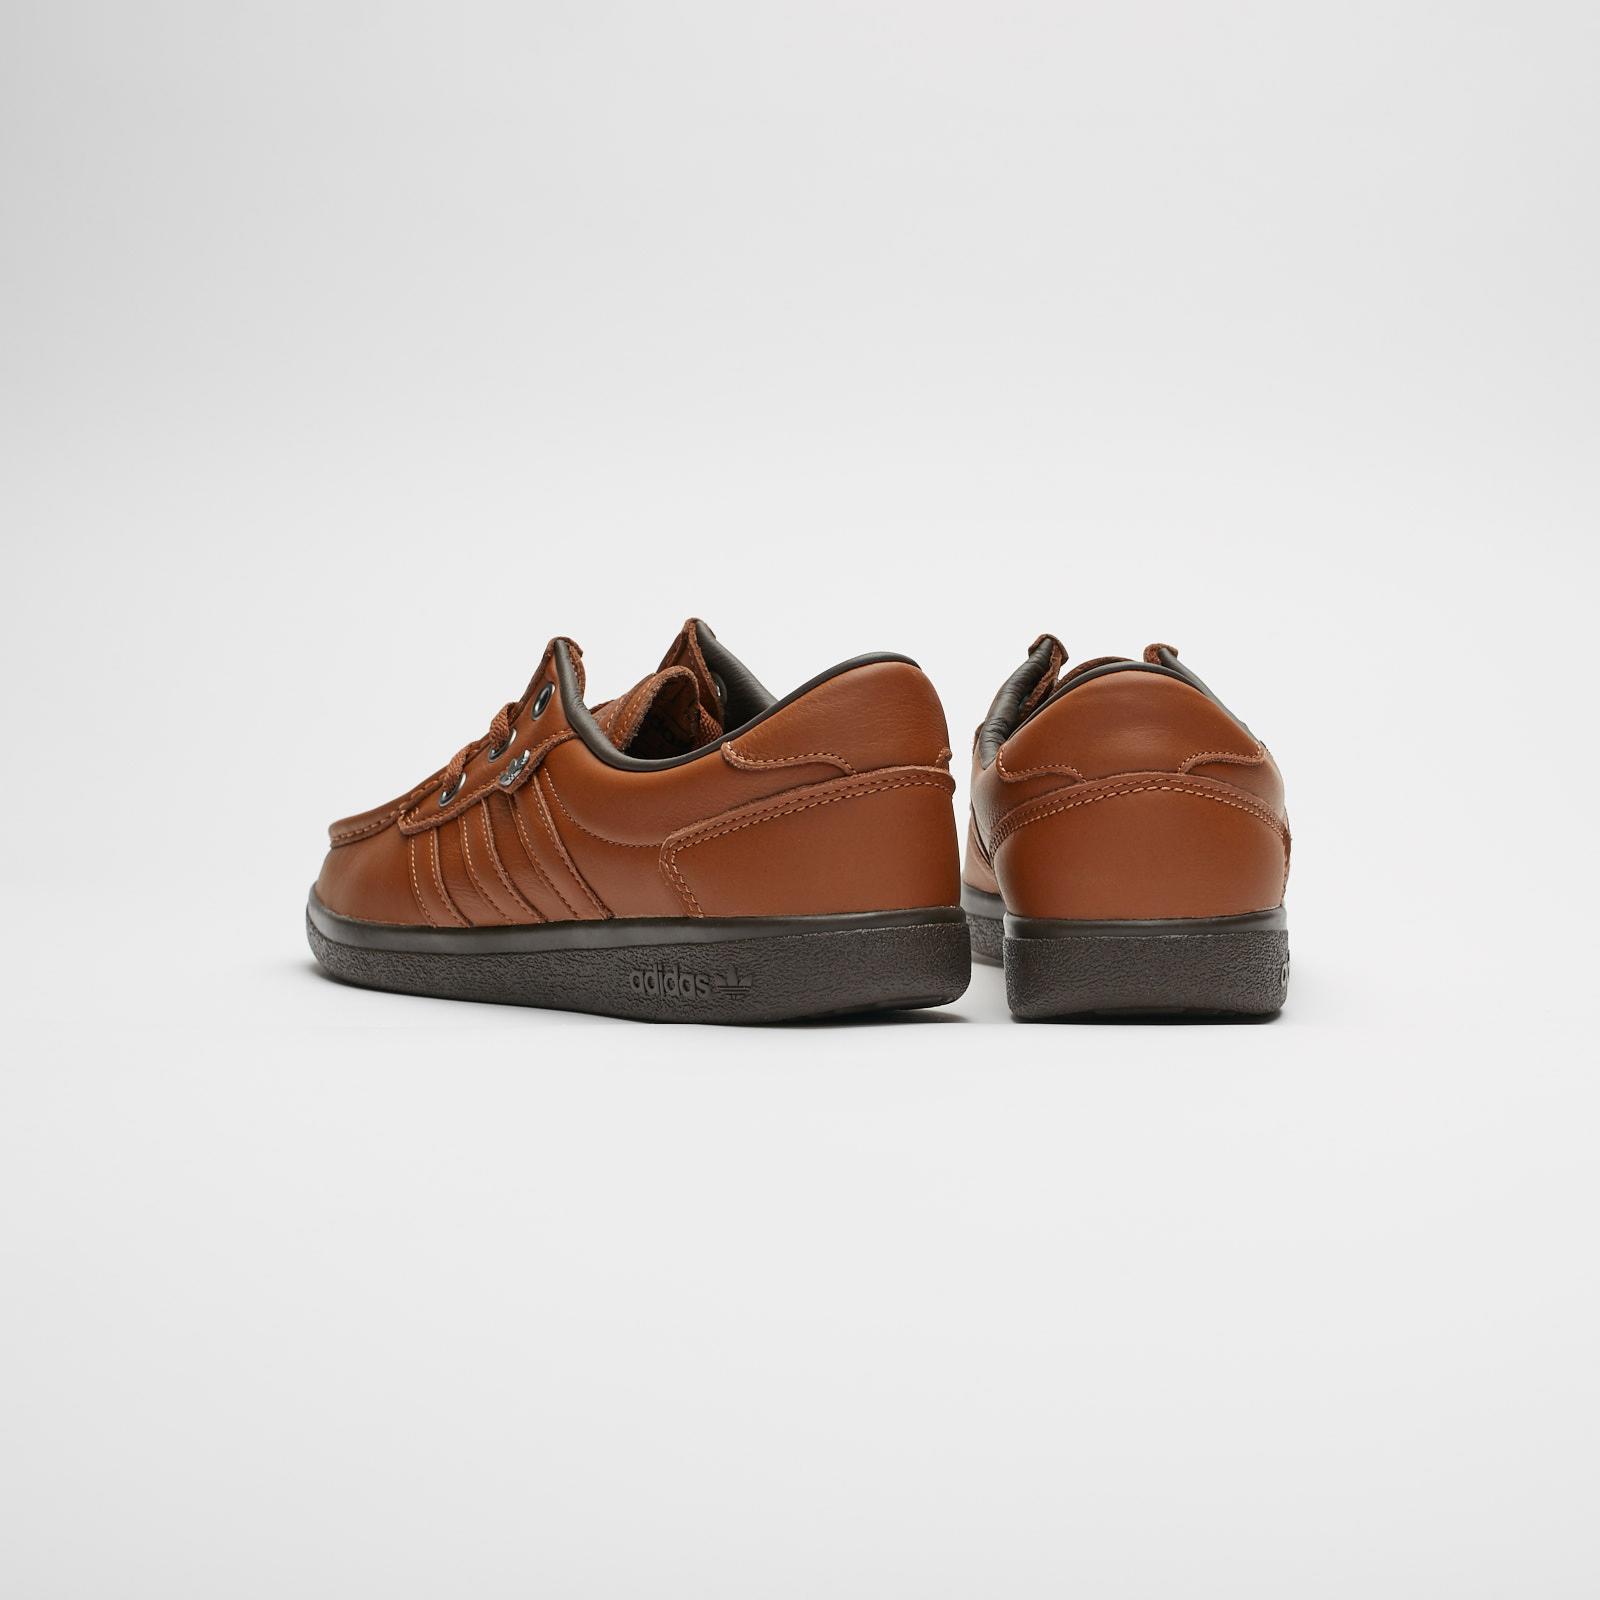 82759d0fcf90 adidas Originals x Spezial Punstock Spzl adidas Originals x Spezial Punstock  Spzl ...